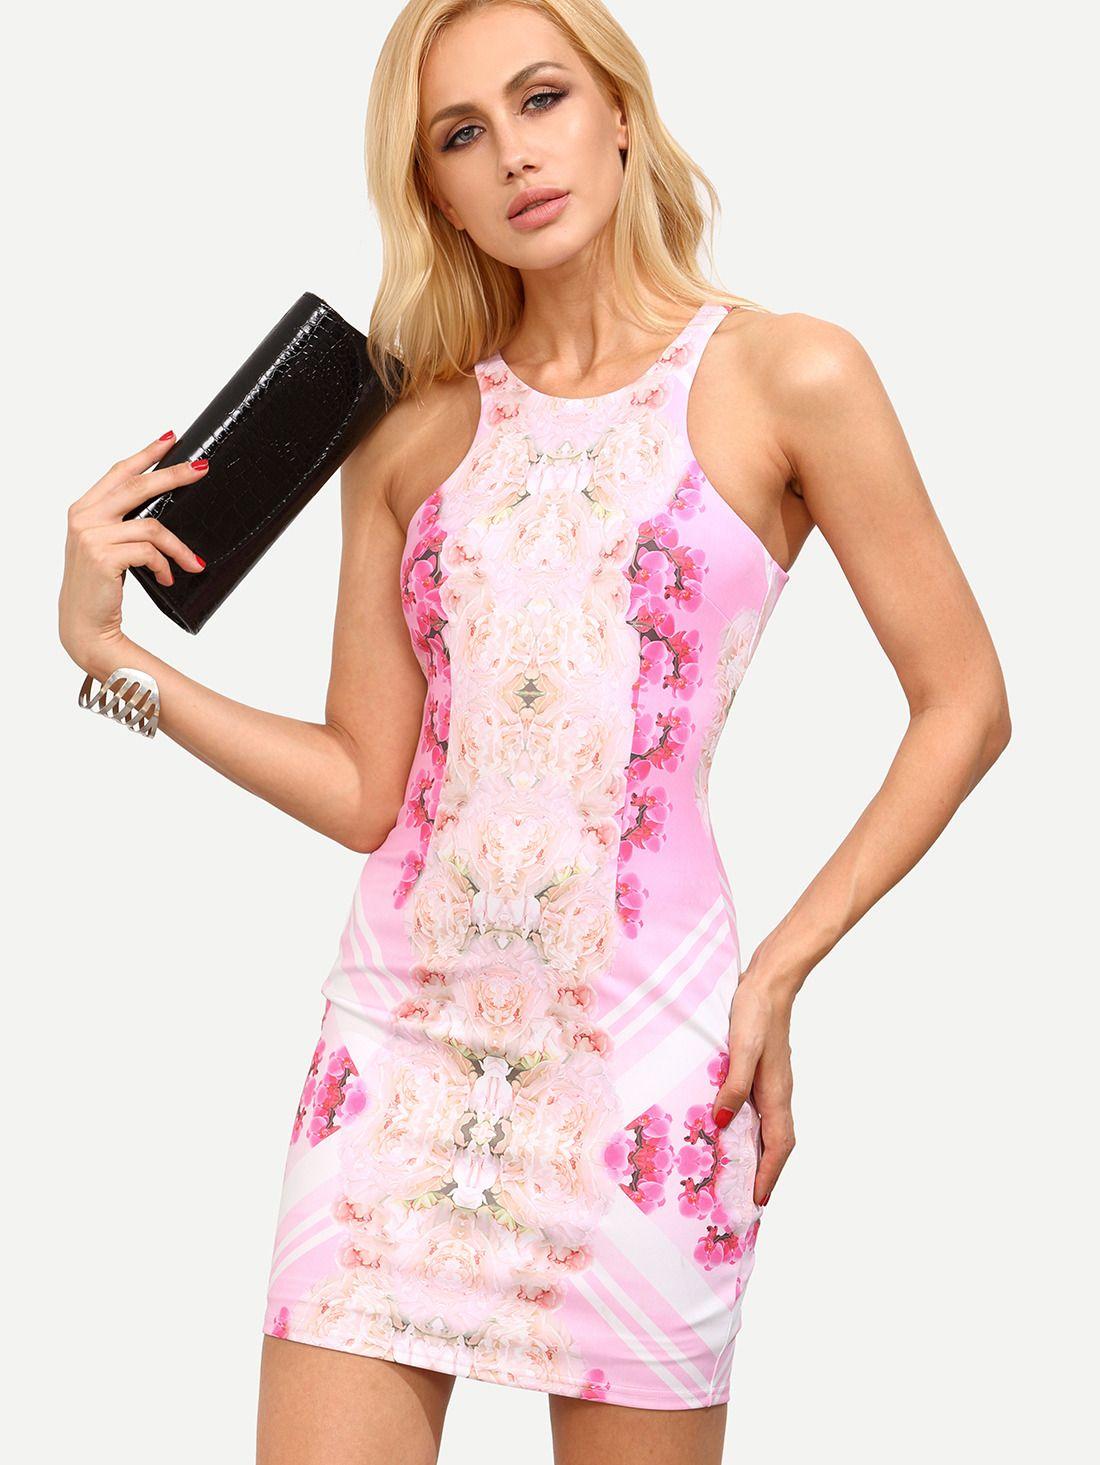 Multicolor floral cutaway bodycon dress shops black sequins and